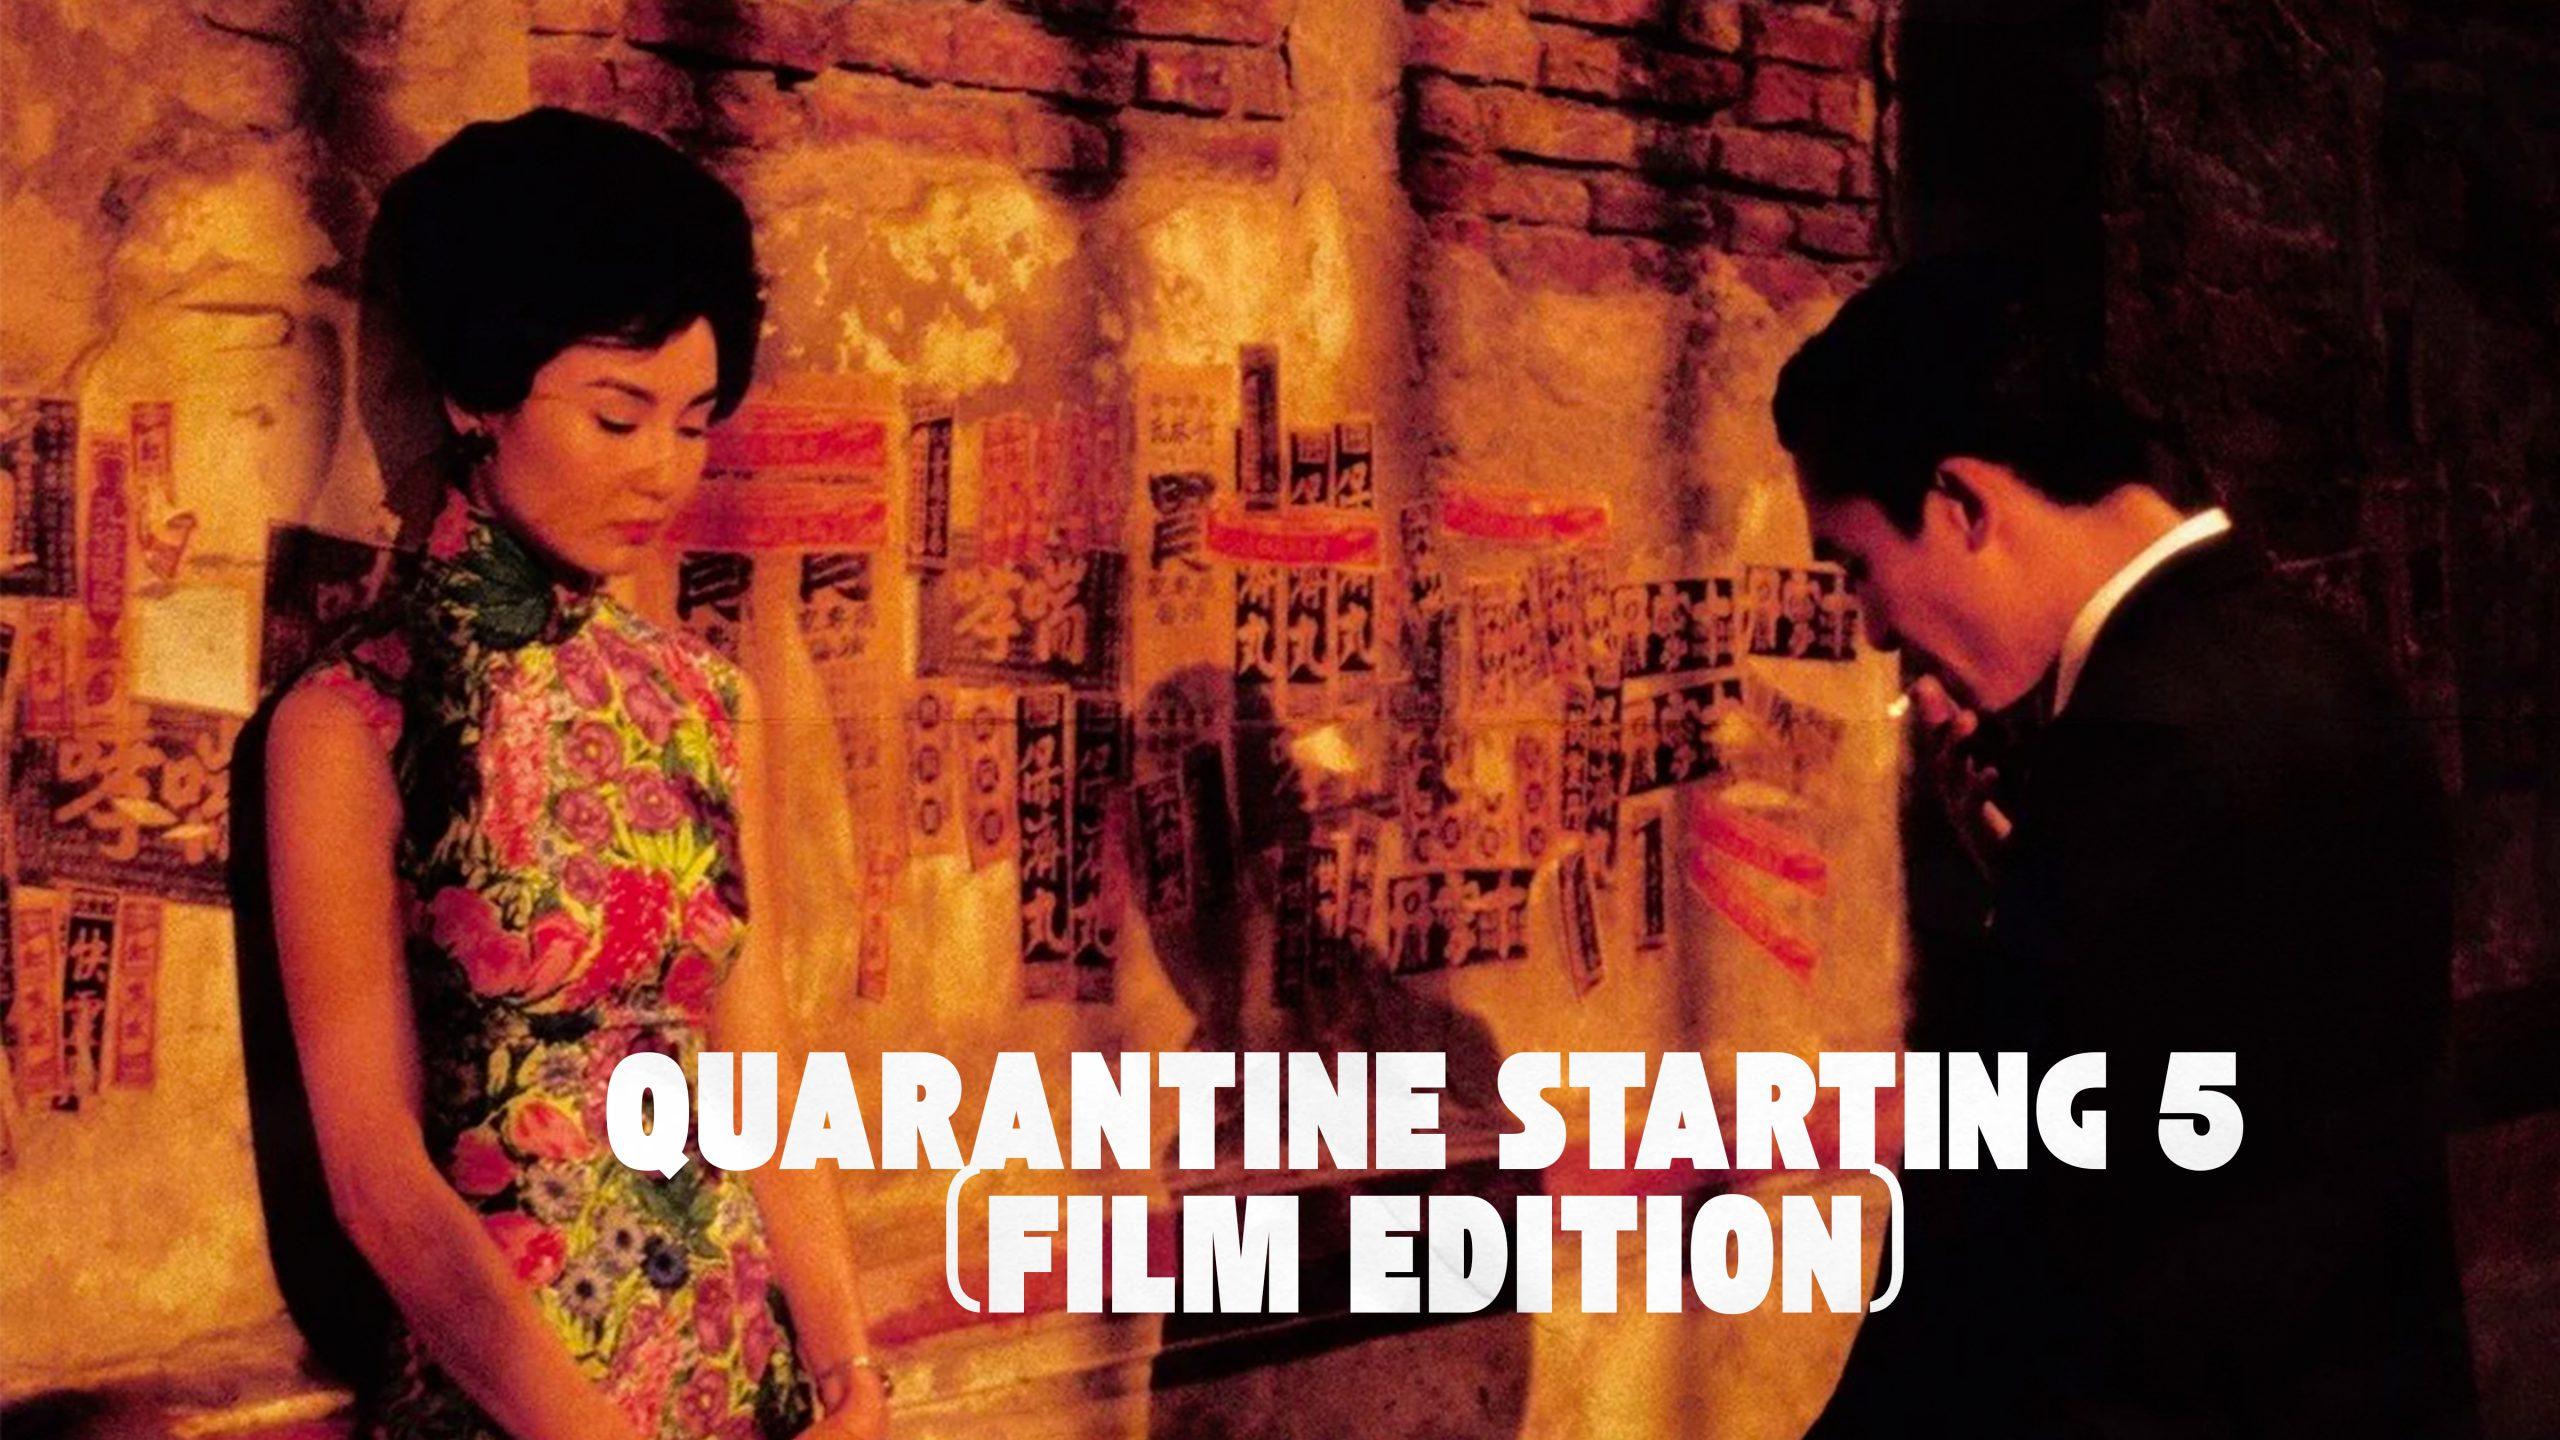 The Quarantine Starting 5